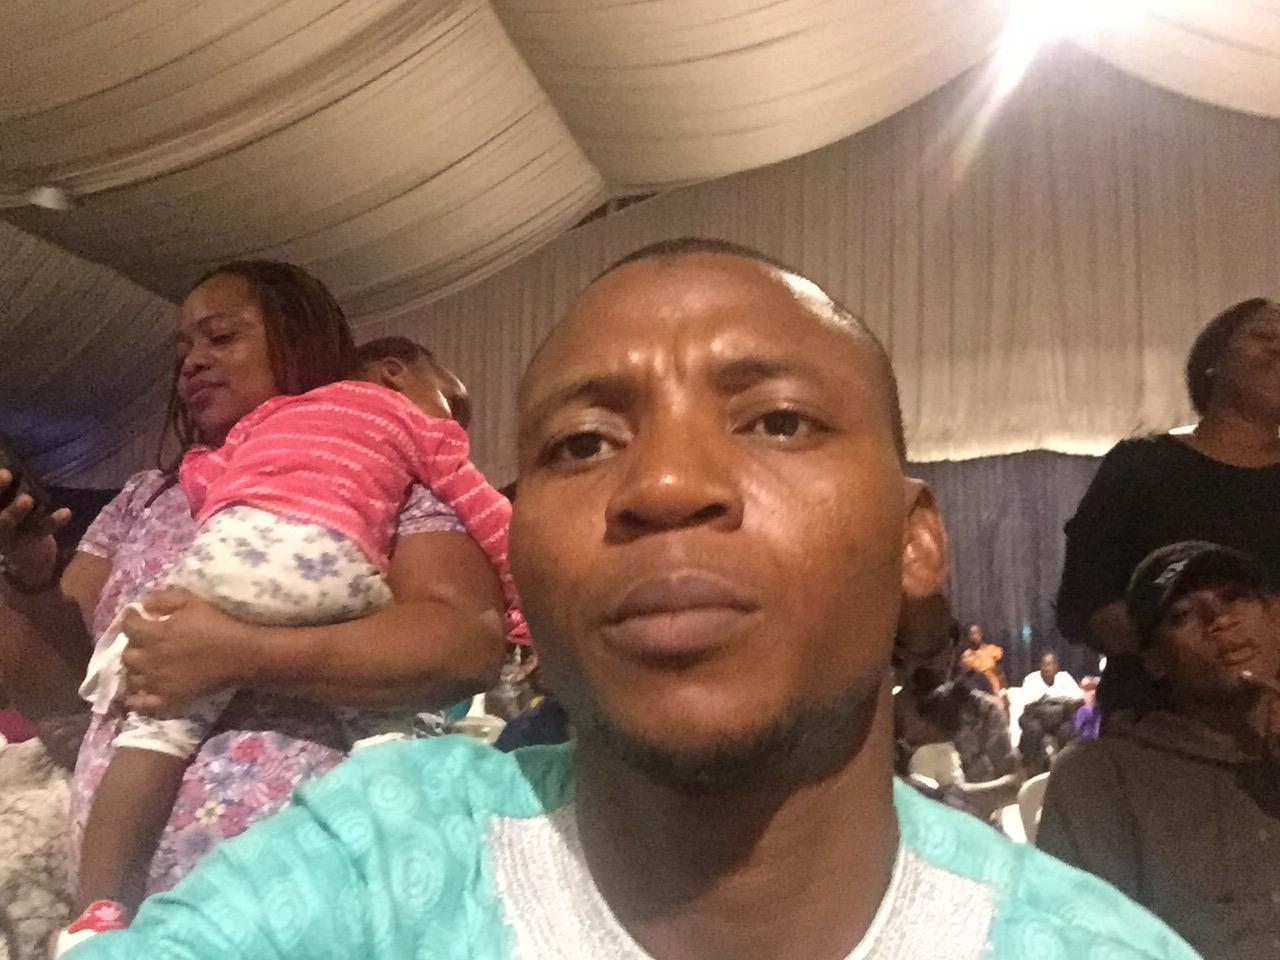 #LAGOSZONE2 #CEISOLONOBHAPPENINGNOW